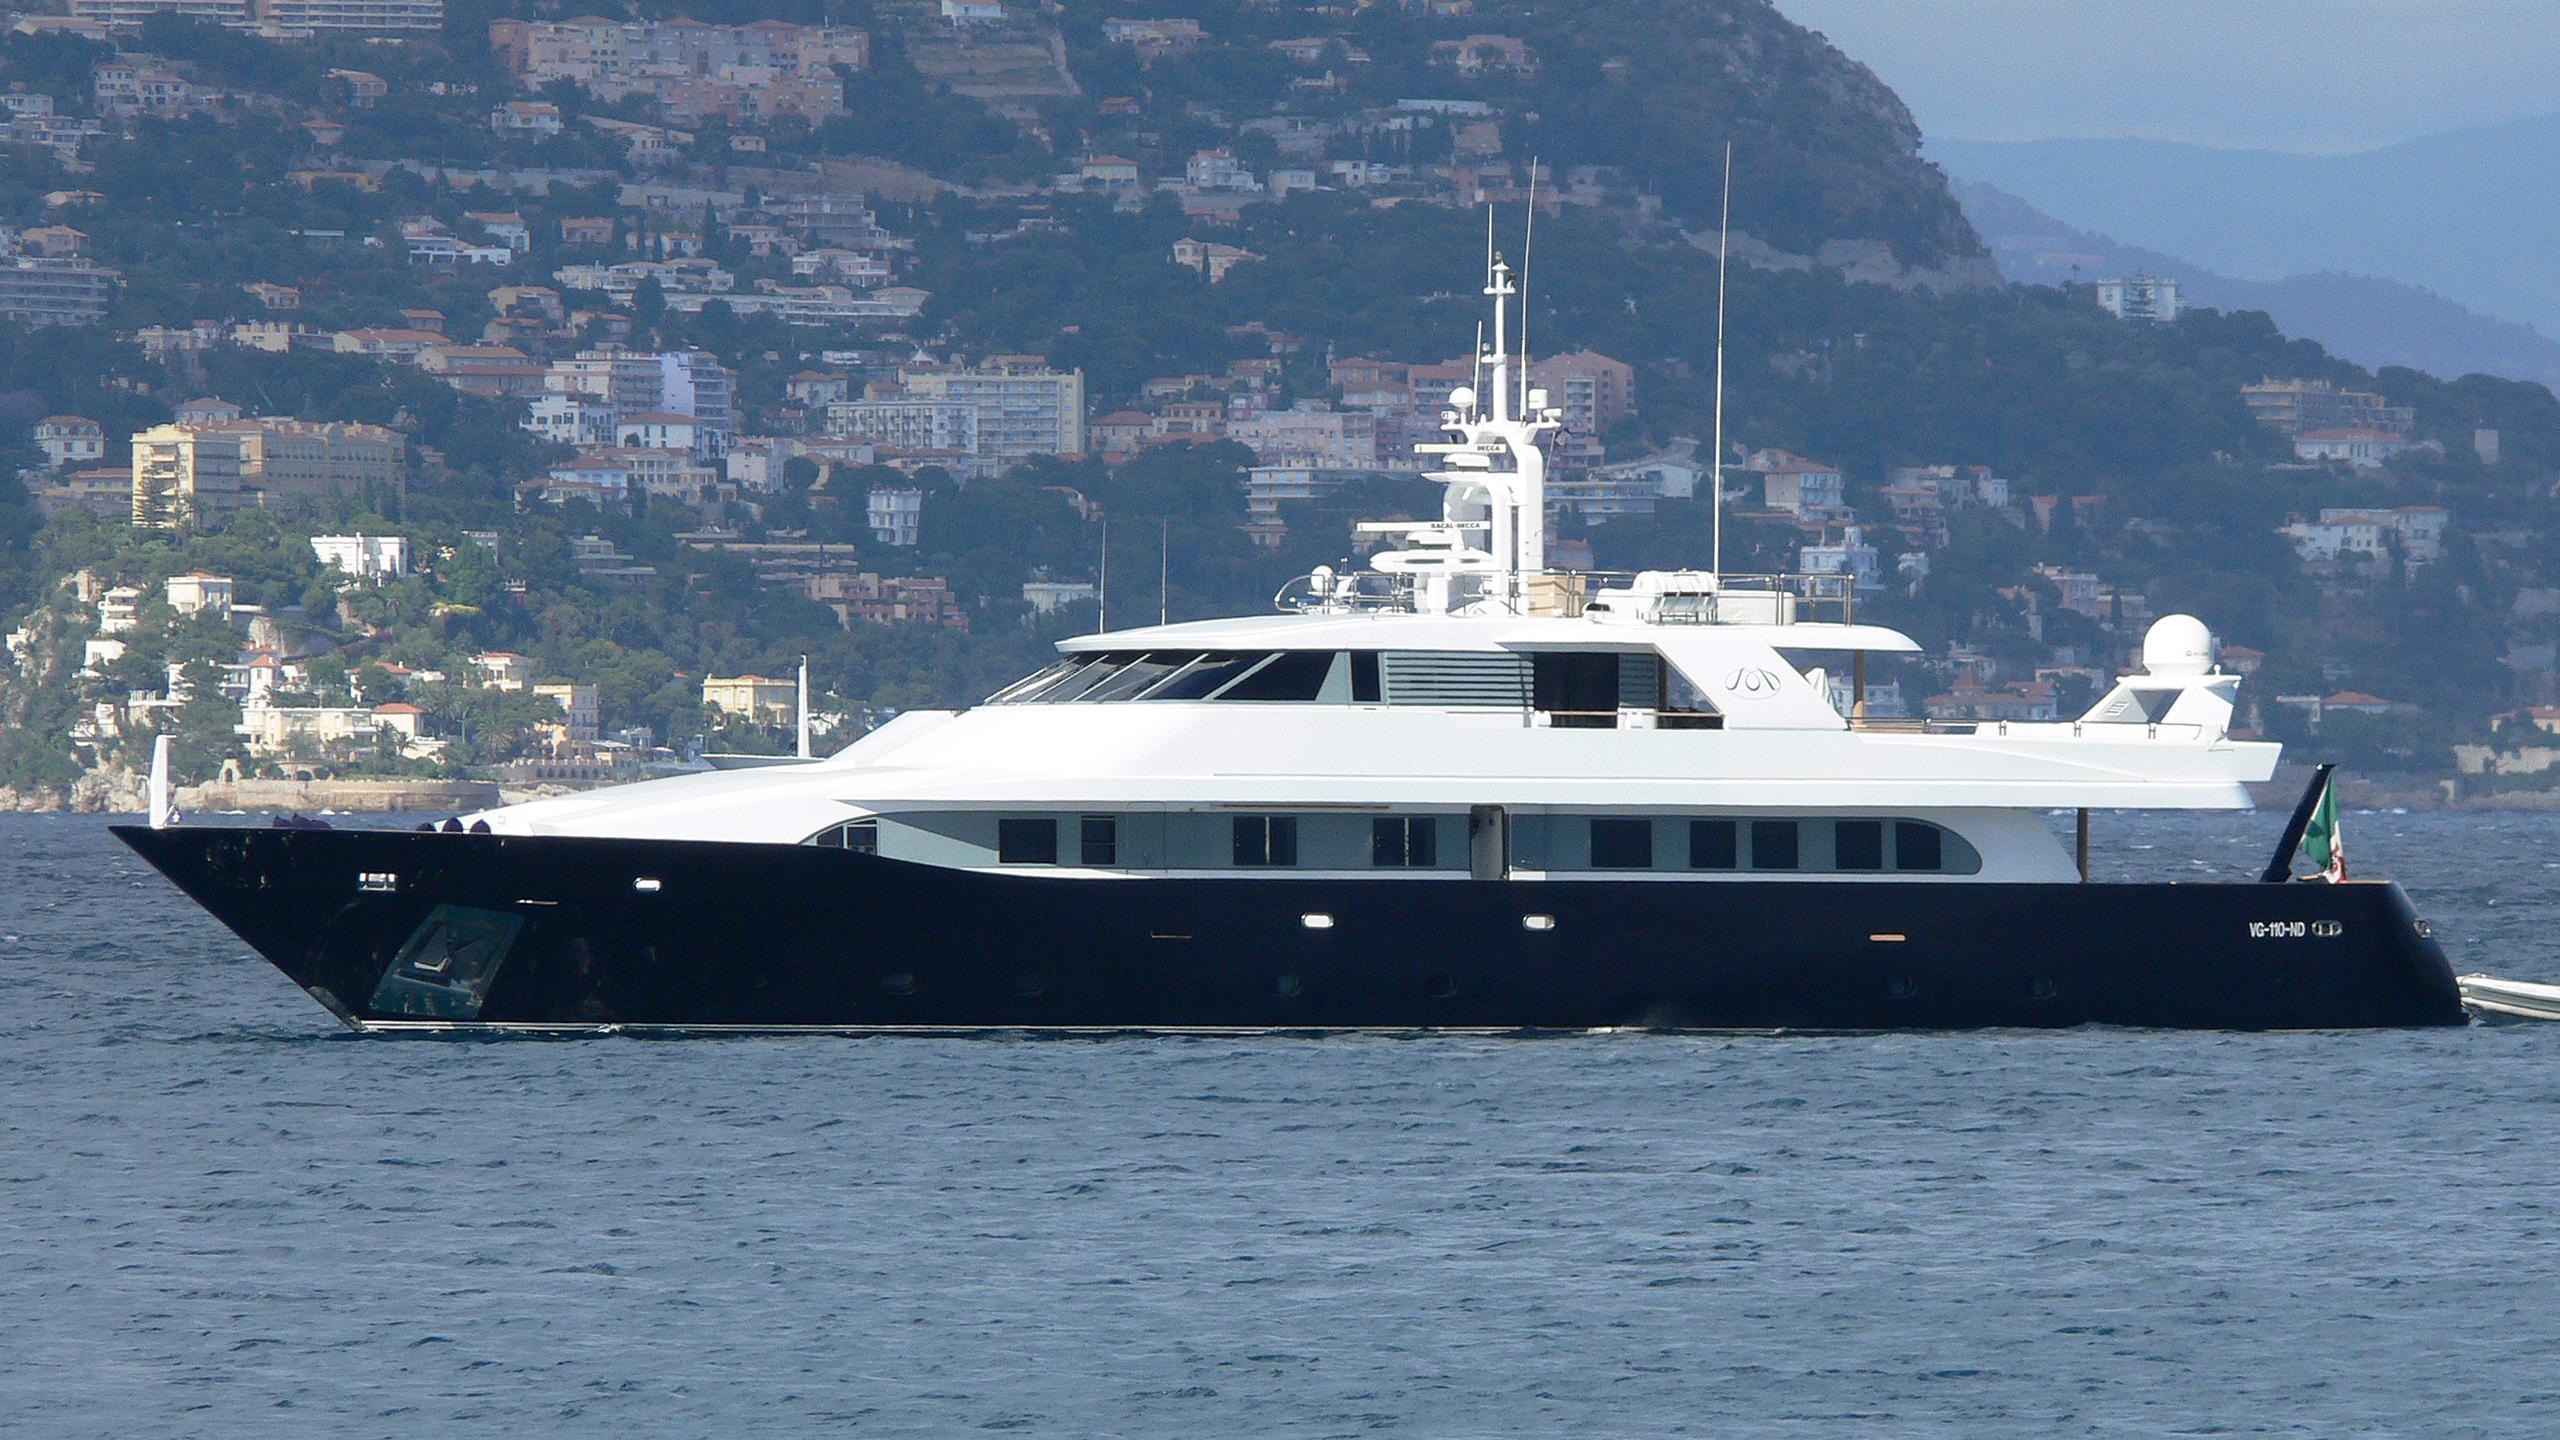 lady-in-blue-motor-yacht-rossinvai-1999-39m-profile